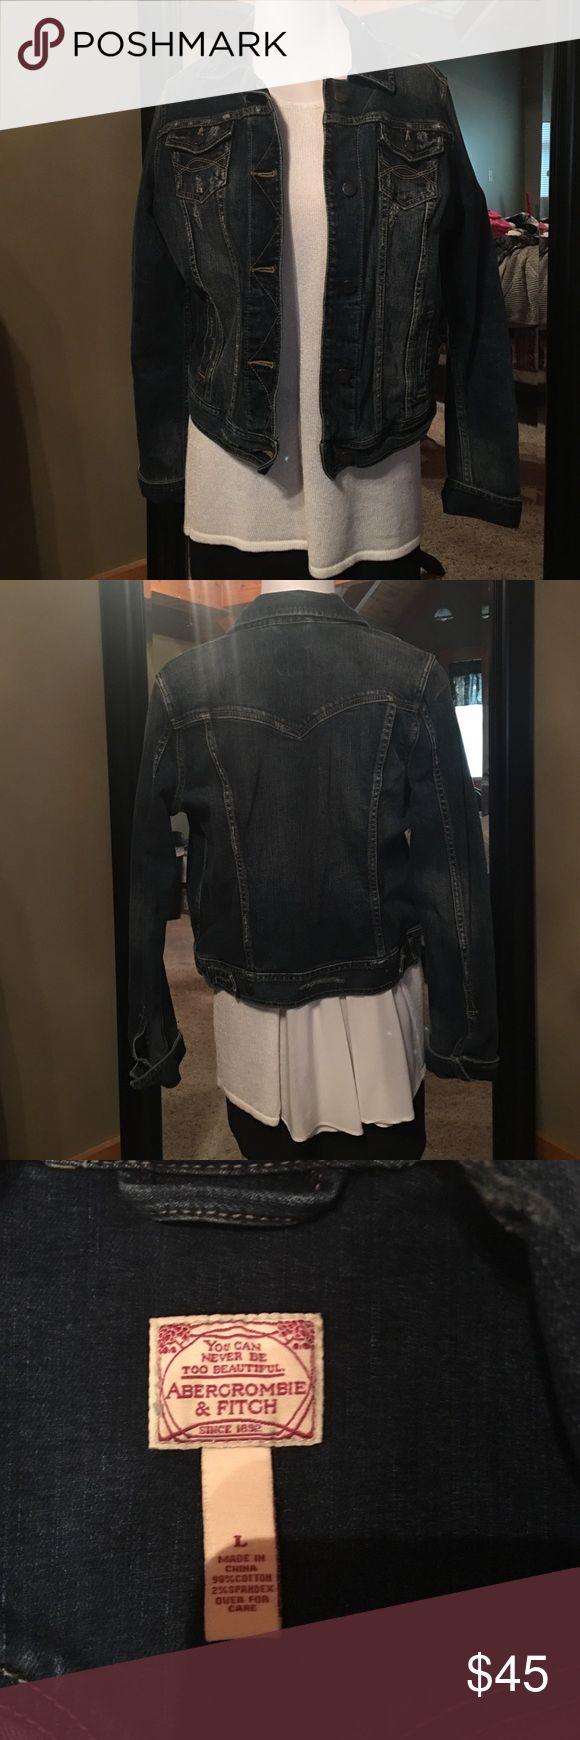 Abercrombie and Fitch denim jacket Dark denim jacket factory destroyed. Abercrombie and Fitch size large. Excellent condition. Abercrombie & Fitch Jackets & Coats Jean Jackets